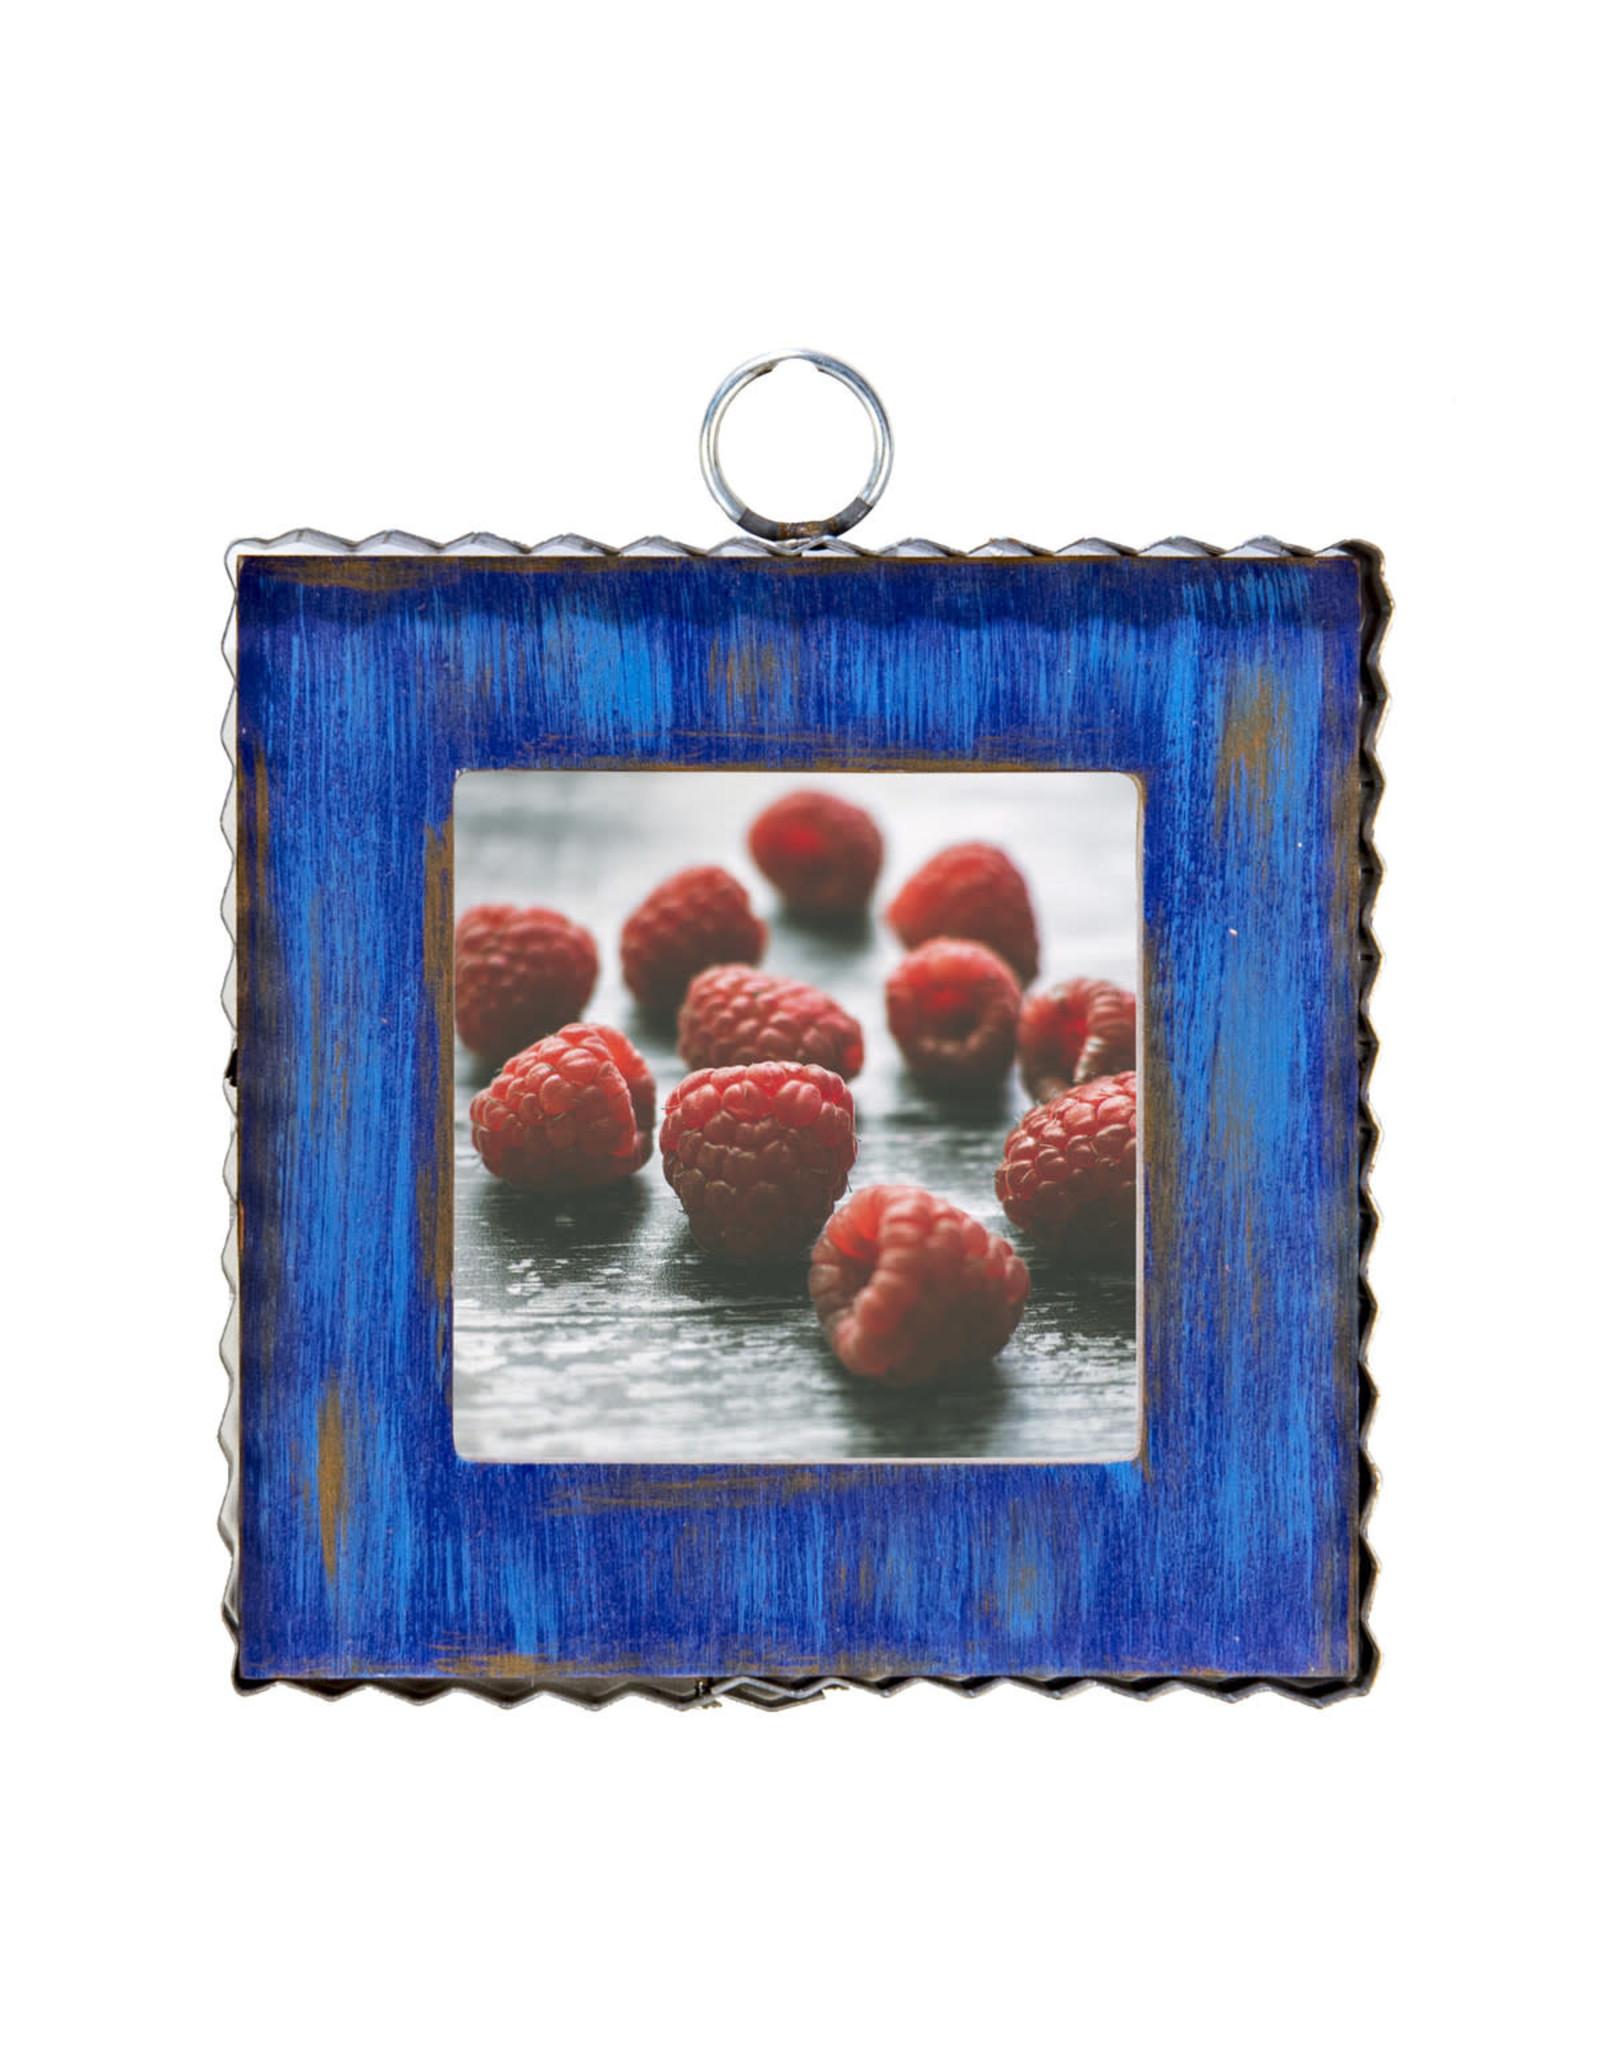 Mini Gallery Pie Crust Photo Frame Blue Charm